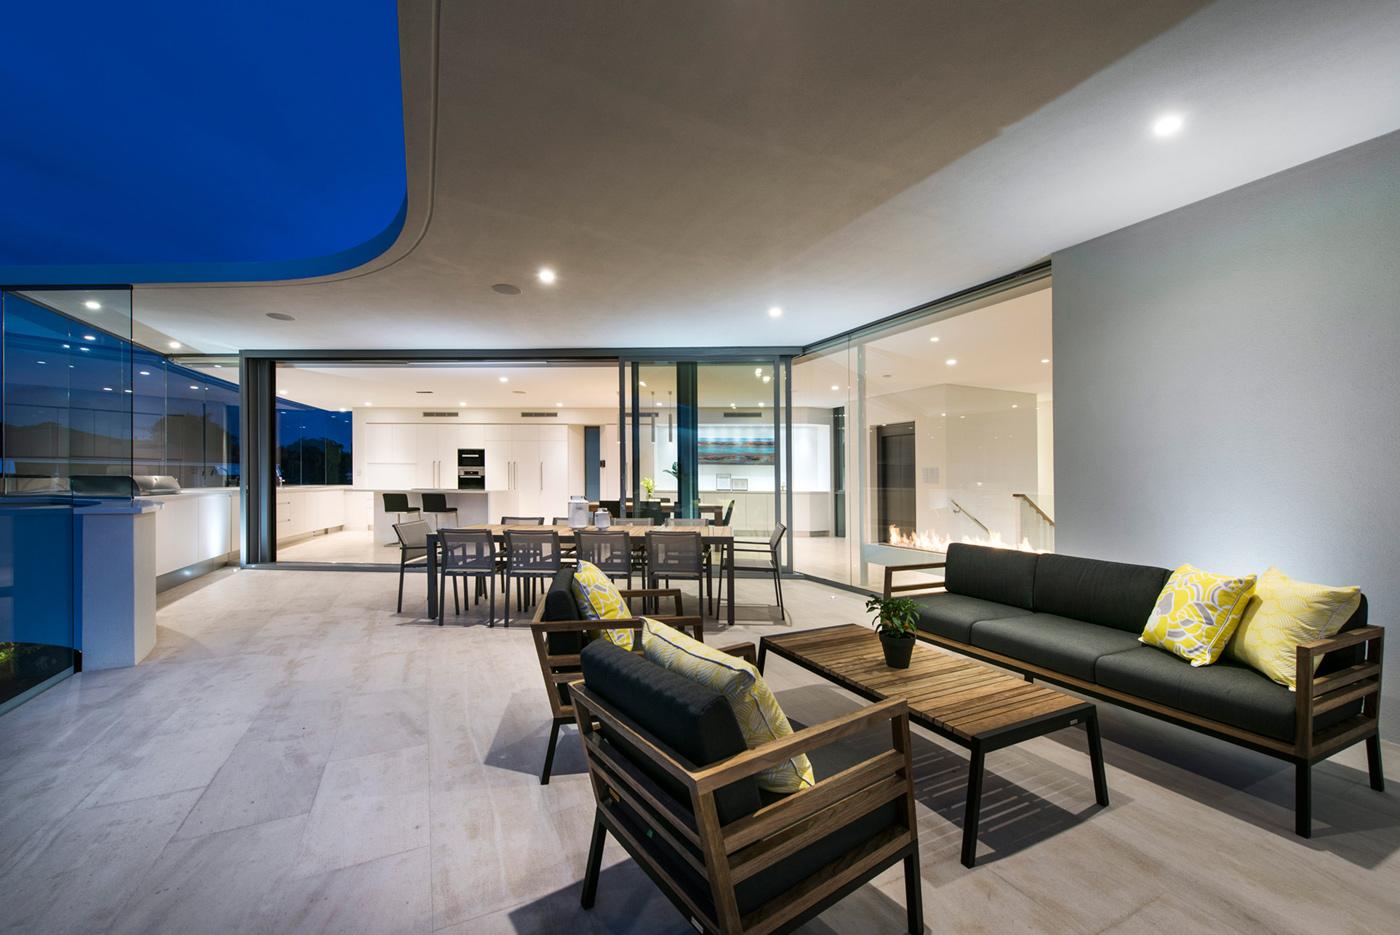 Image Result For Luxury Bedroom Furniture